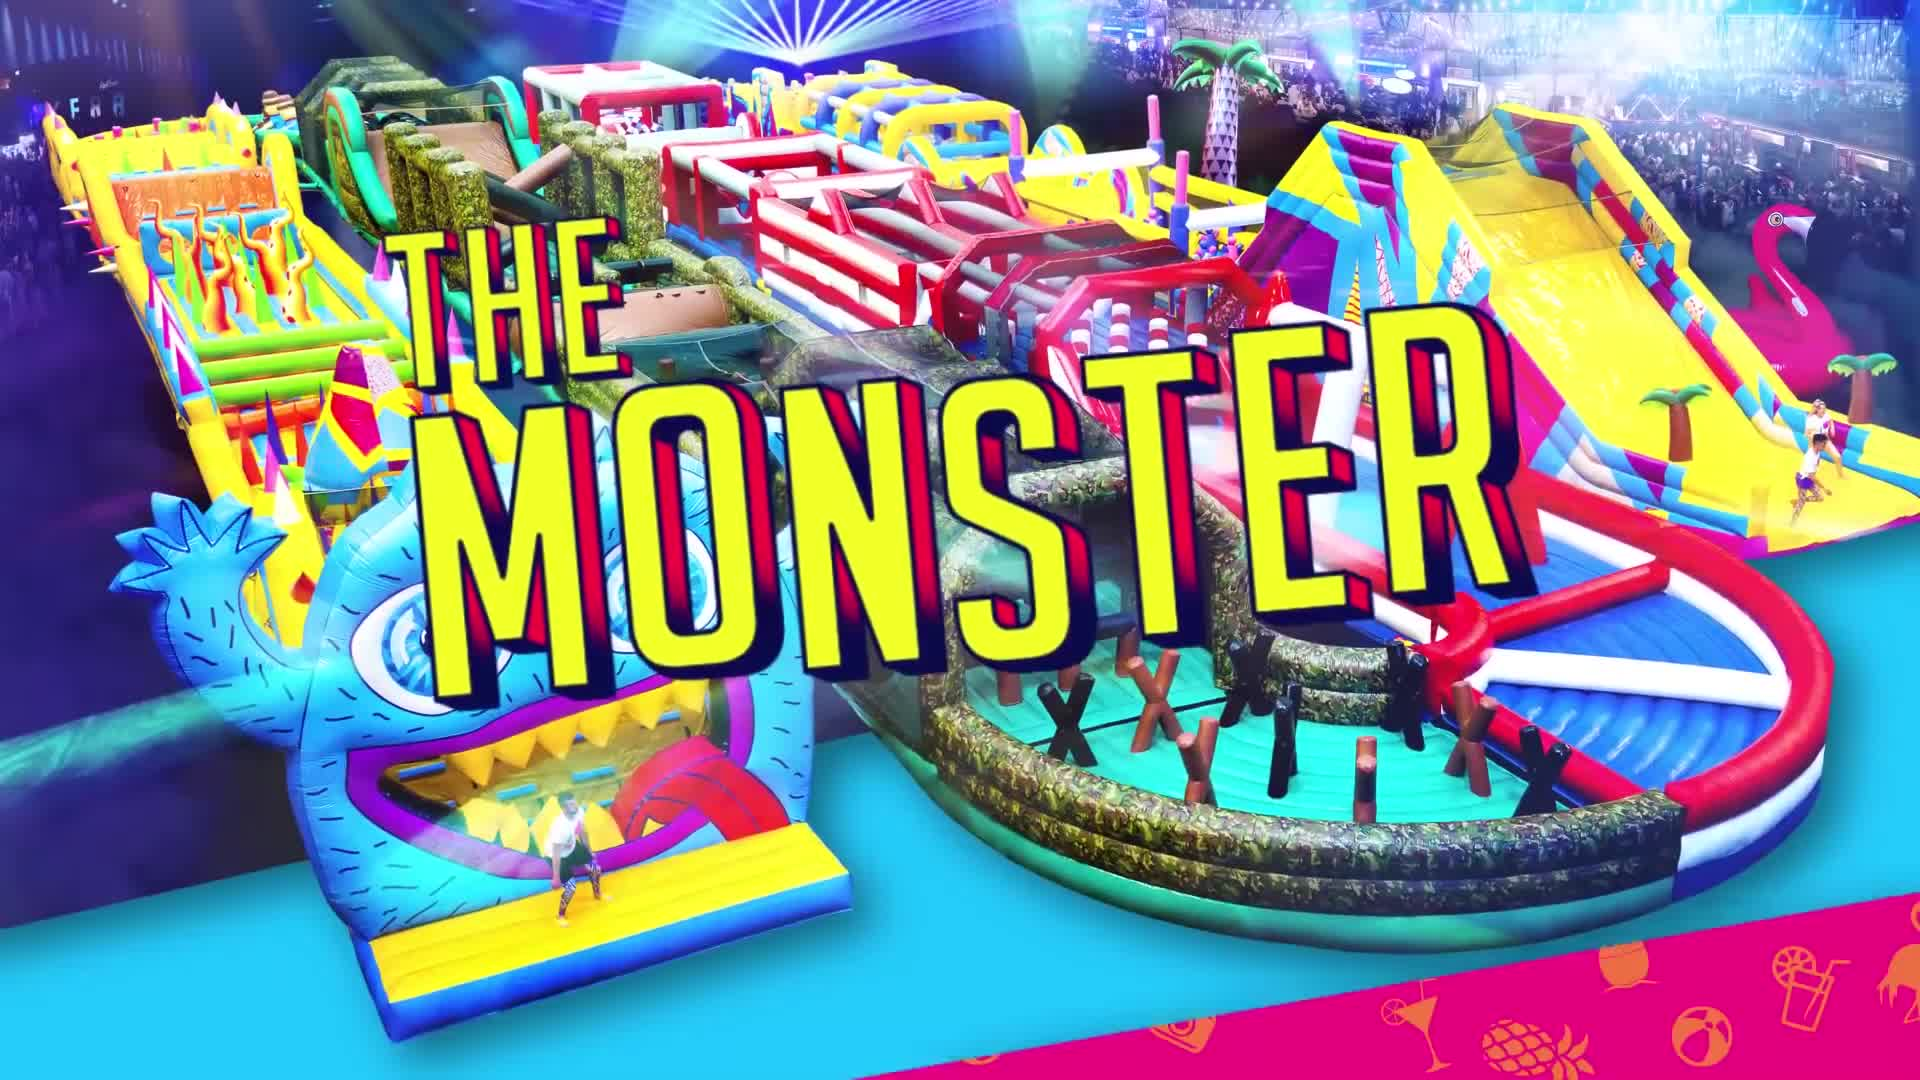 Customer design UK inflatable monster obstacles